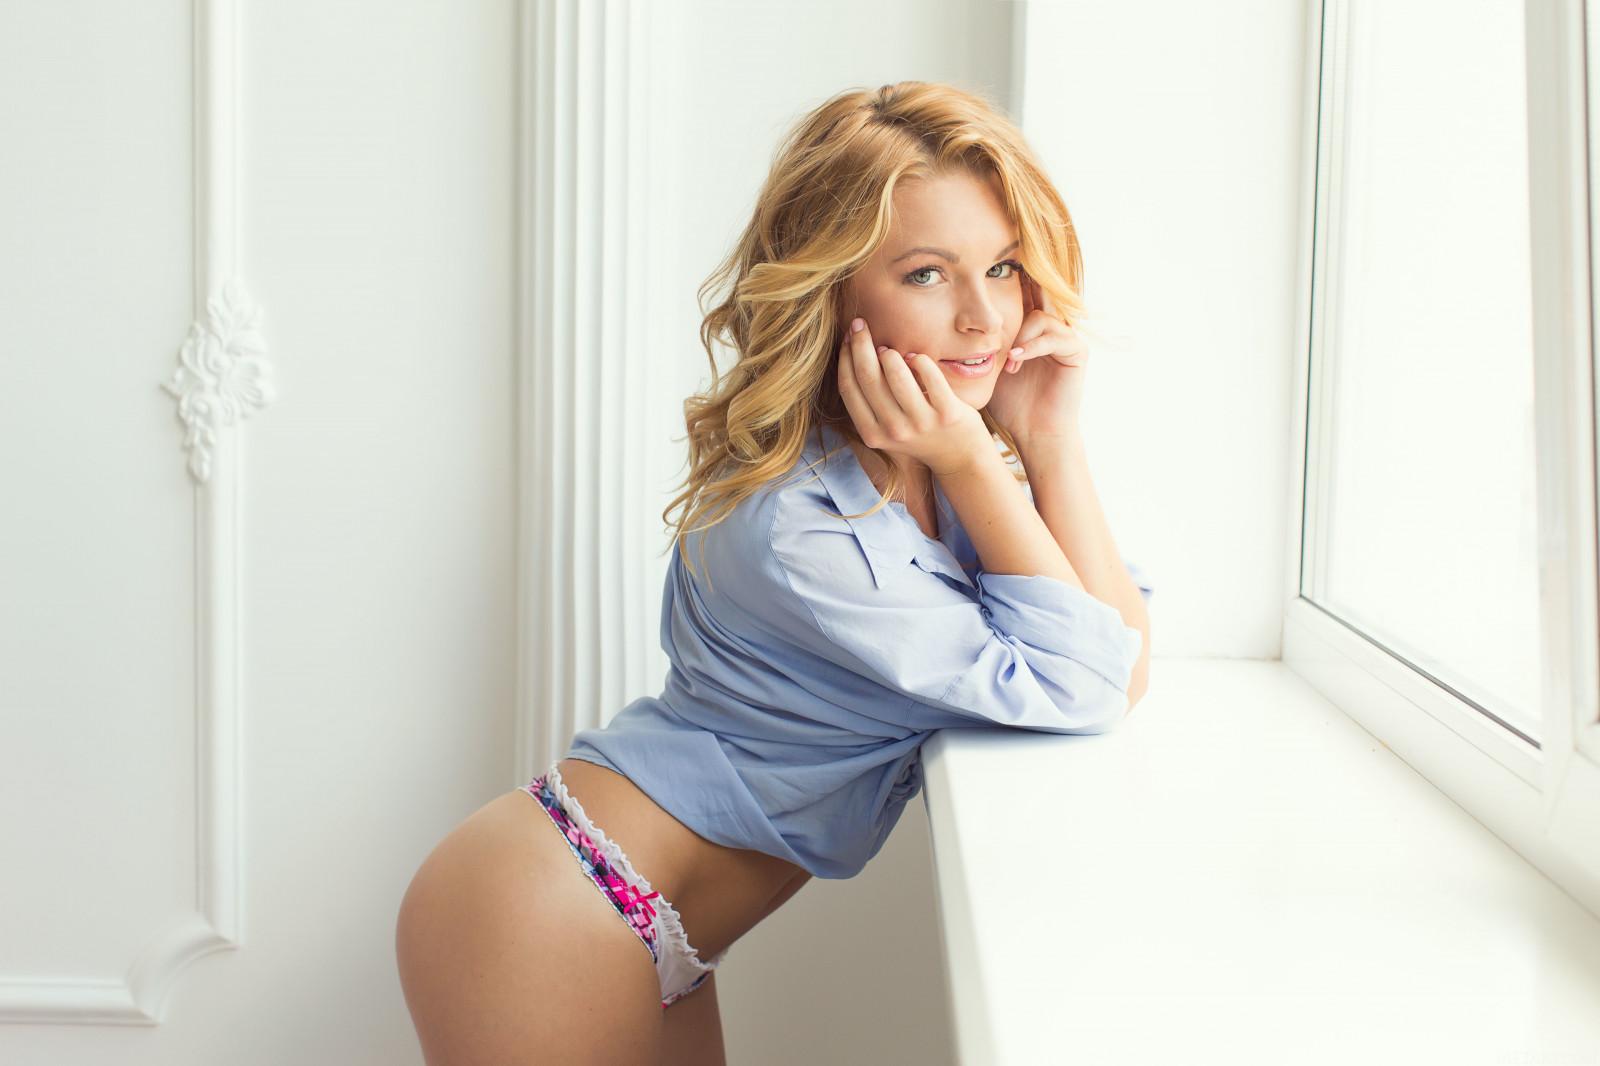 wallpaper : women, model, portrait, blonde, window, long hair, ass